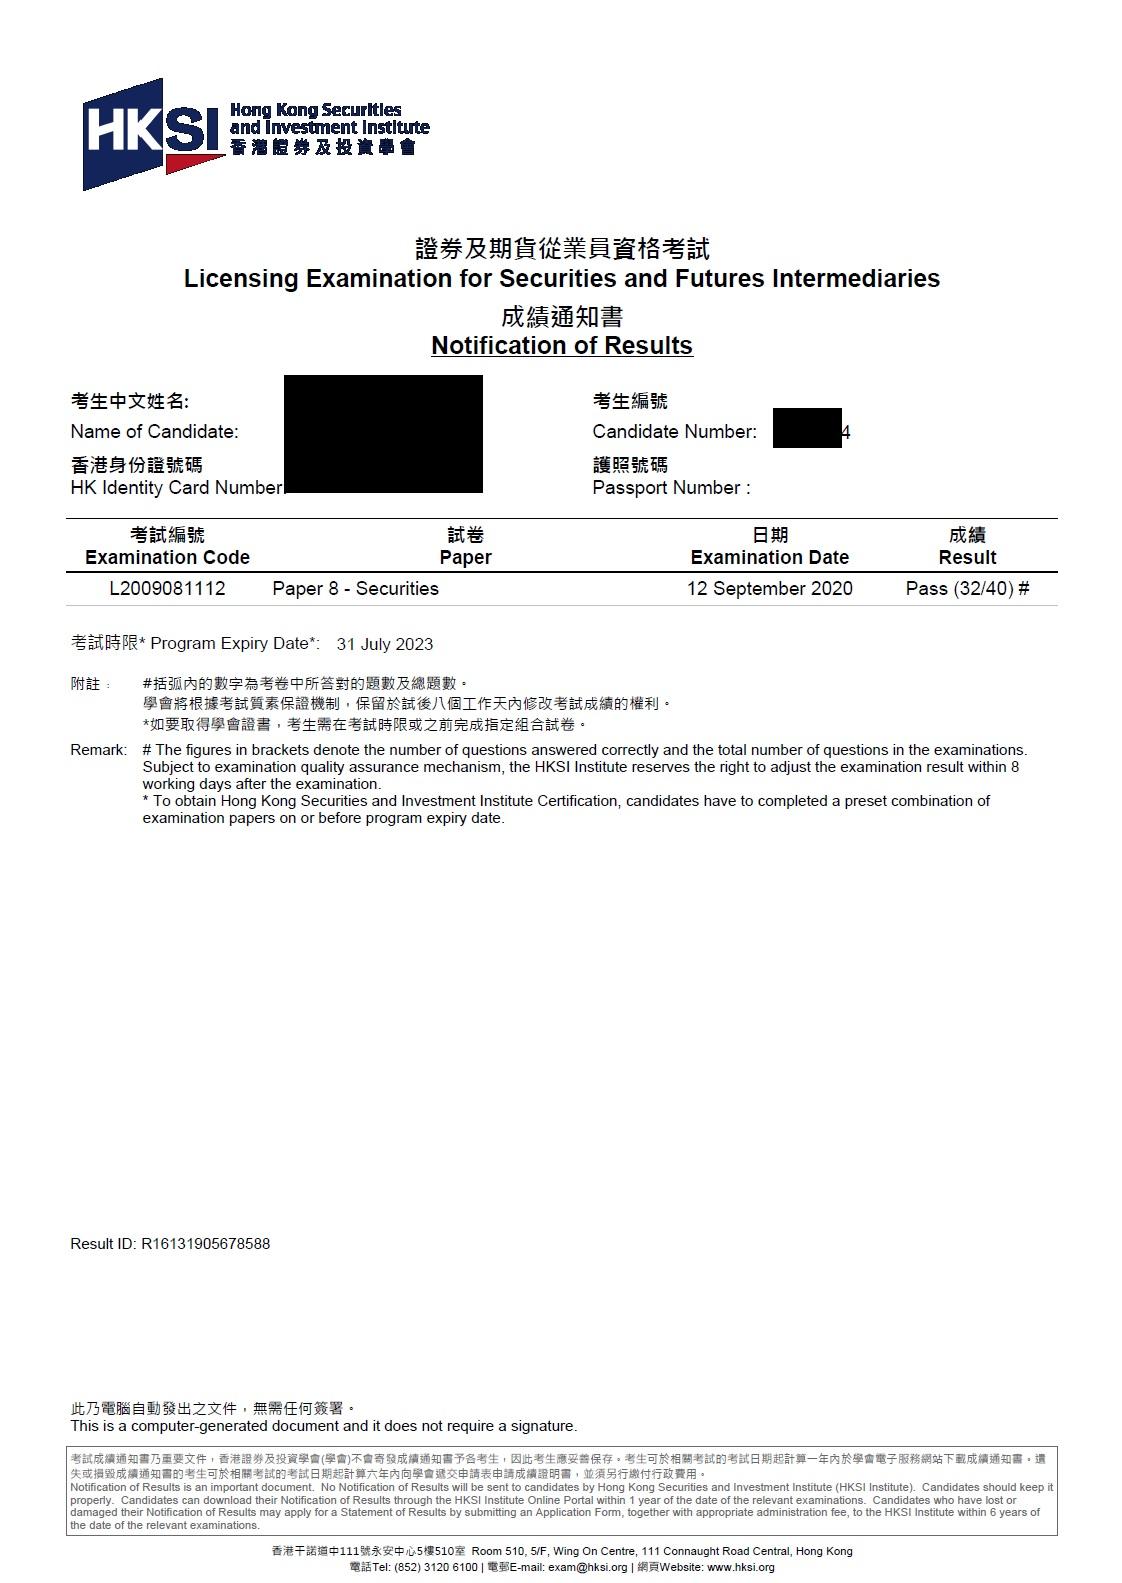 HYC 12/09/2020 LE Paper 8 證券期貨從業員資格考試卷八 Pass